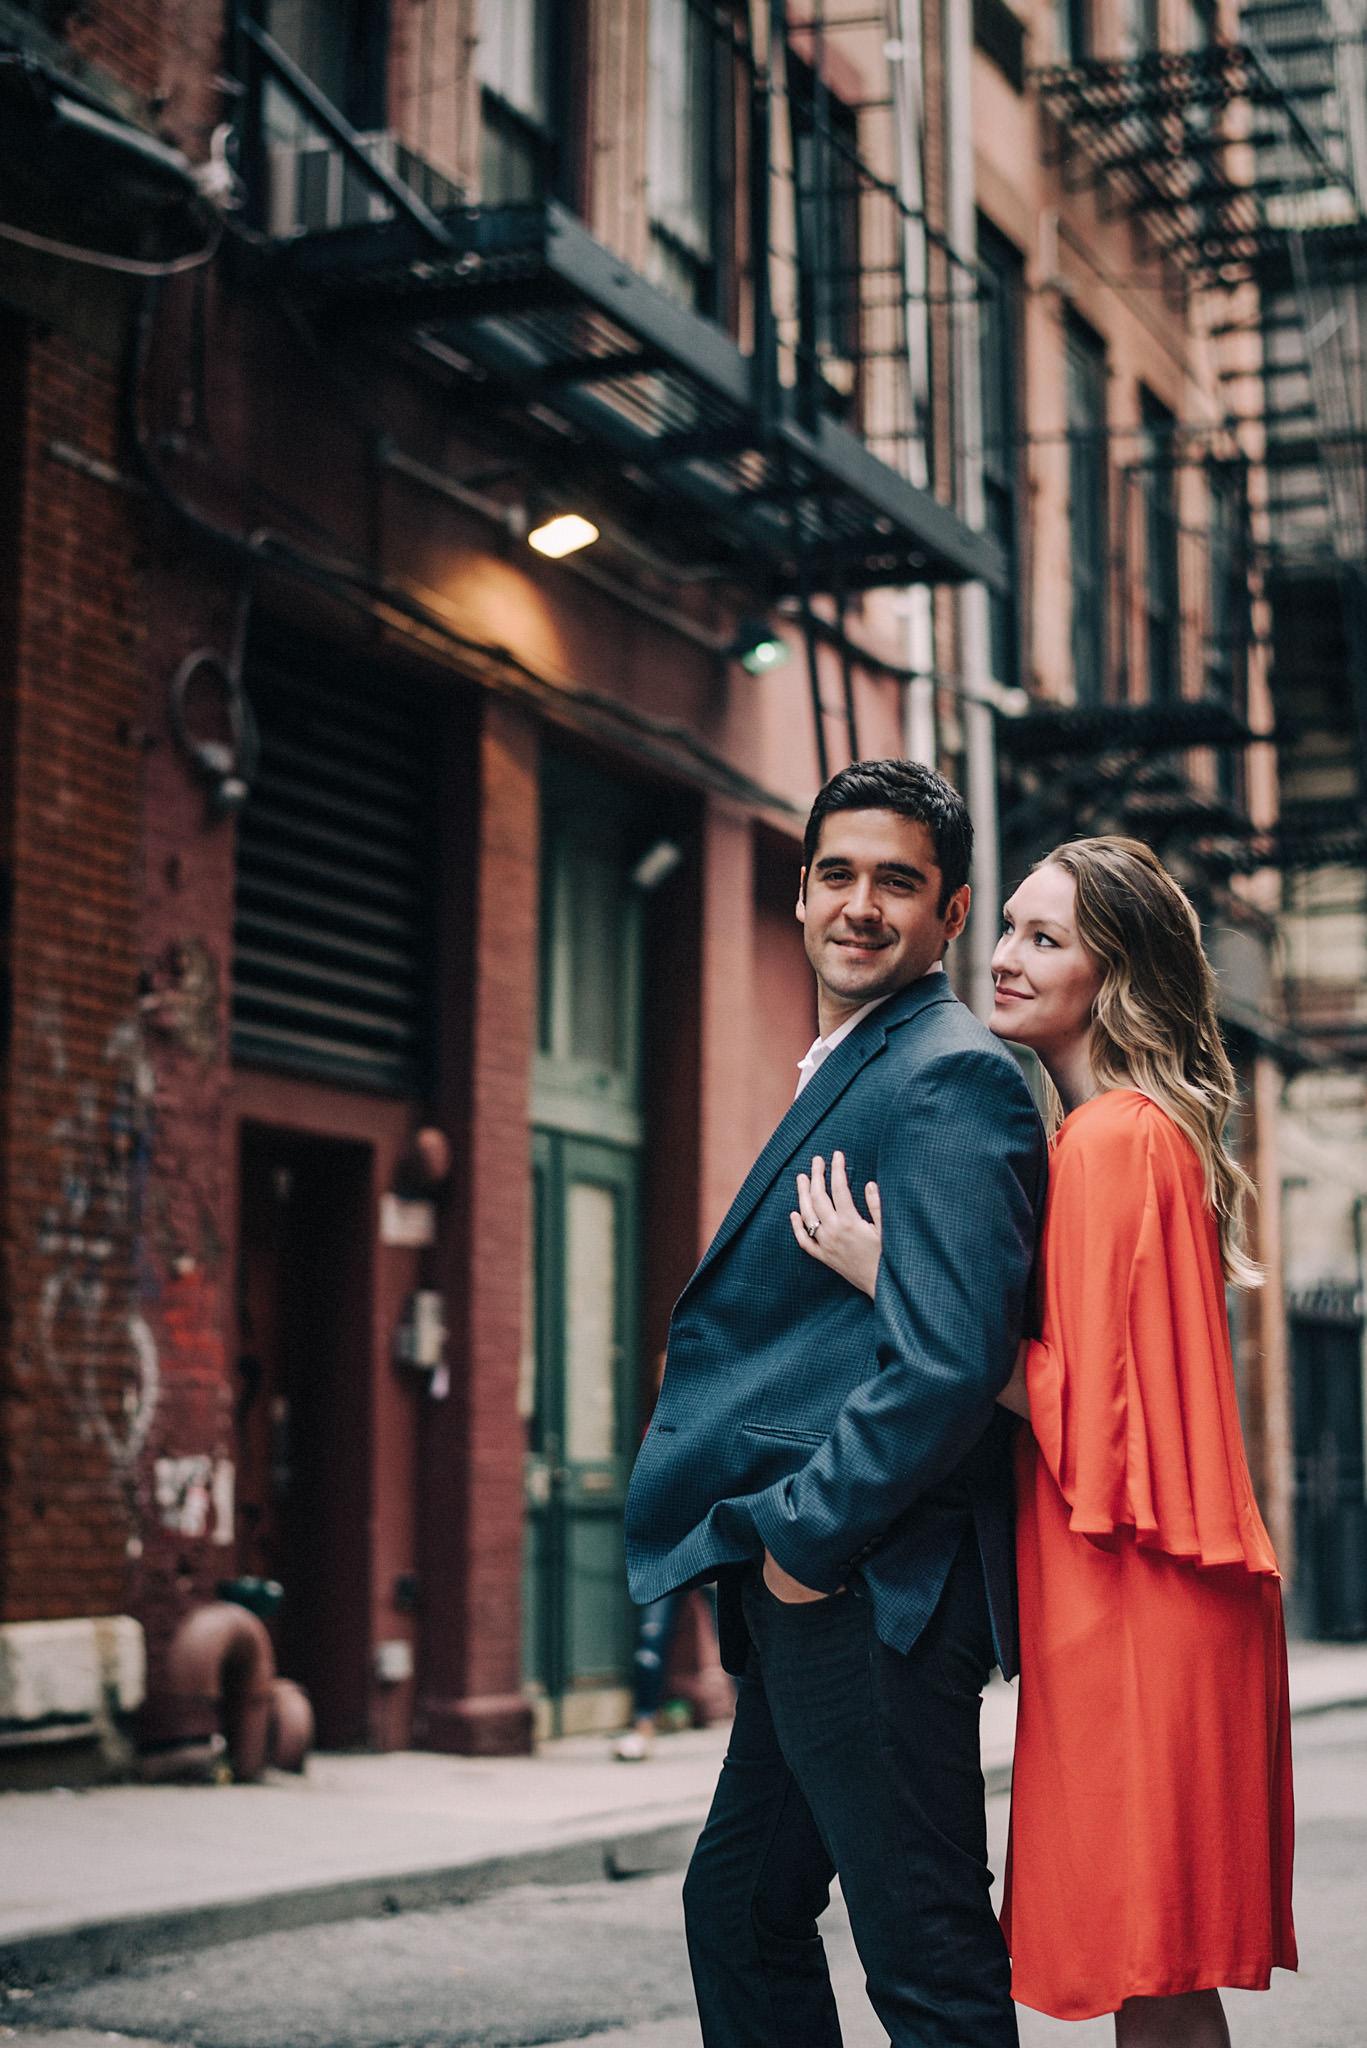 New-York-Photographer-Engagement-Felipe-Carranza-28